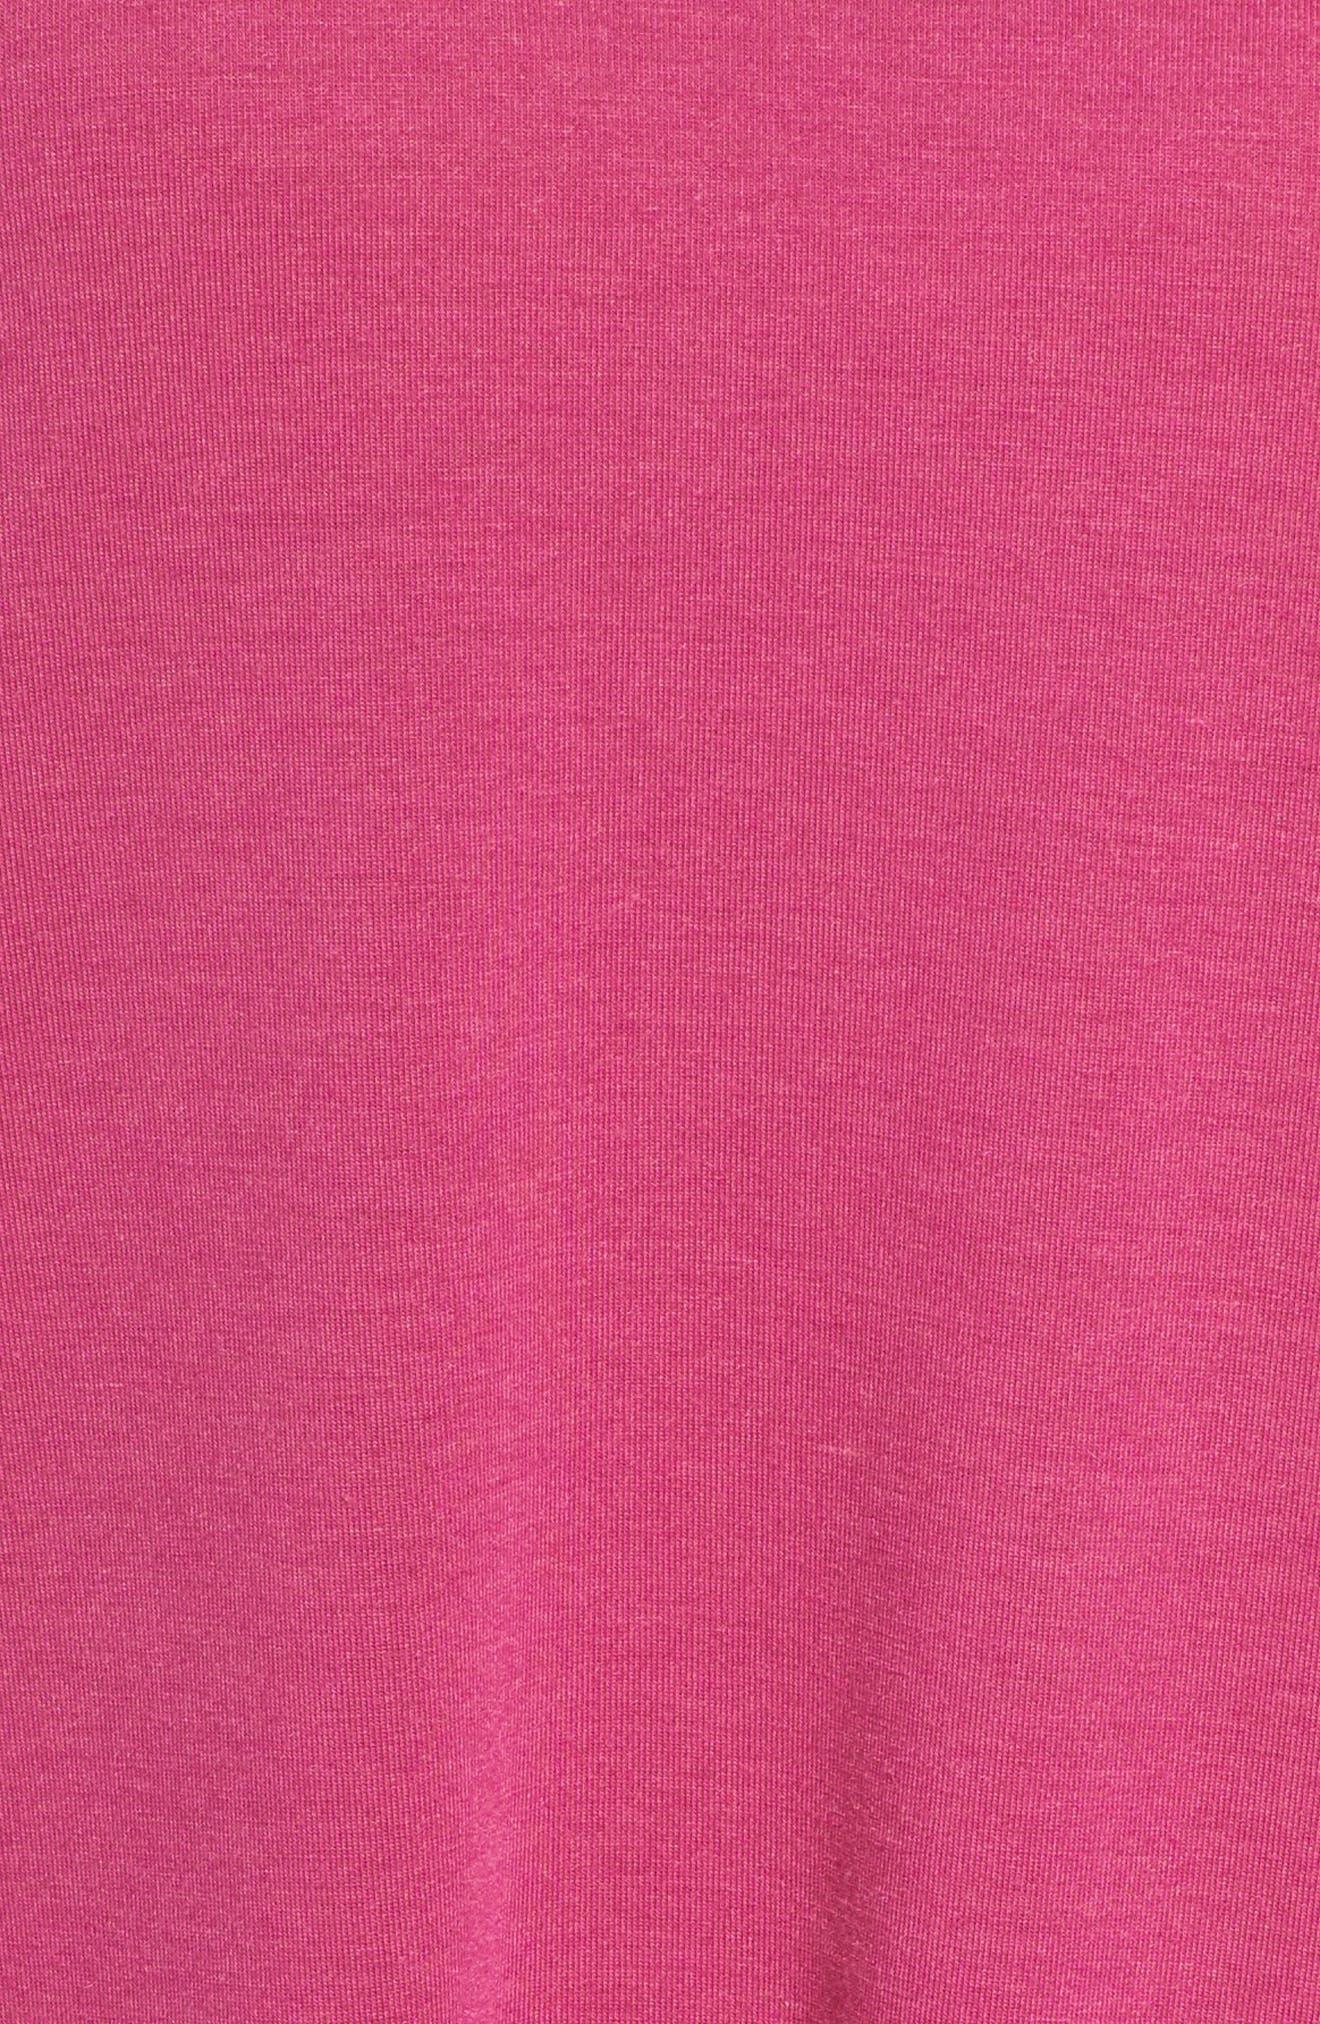 Honeydew All American Sleep Shirt,                             Alternate thumbnail 5, color,                             Ritz